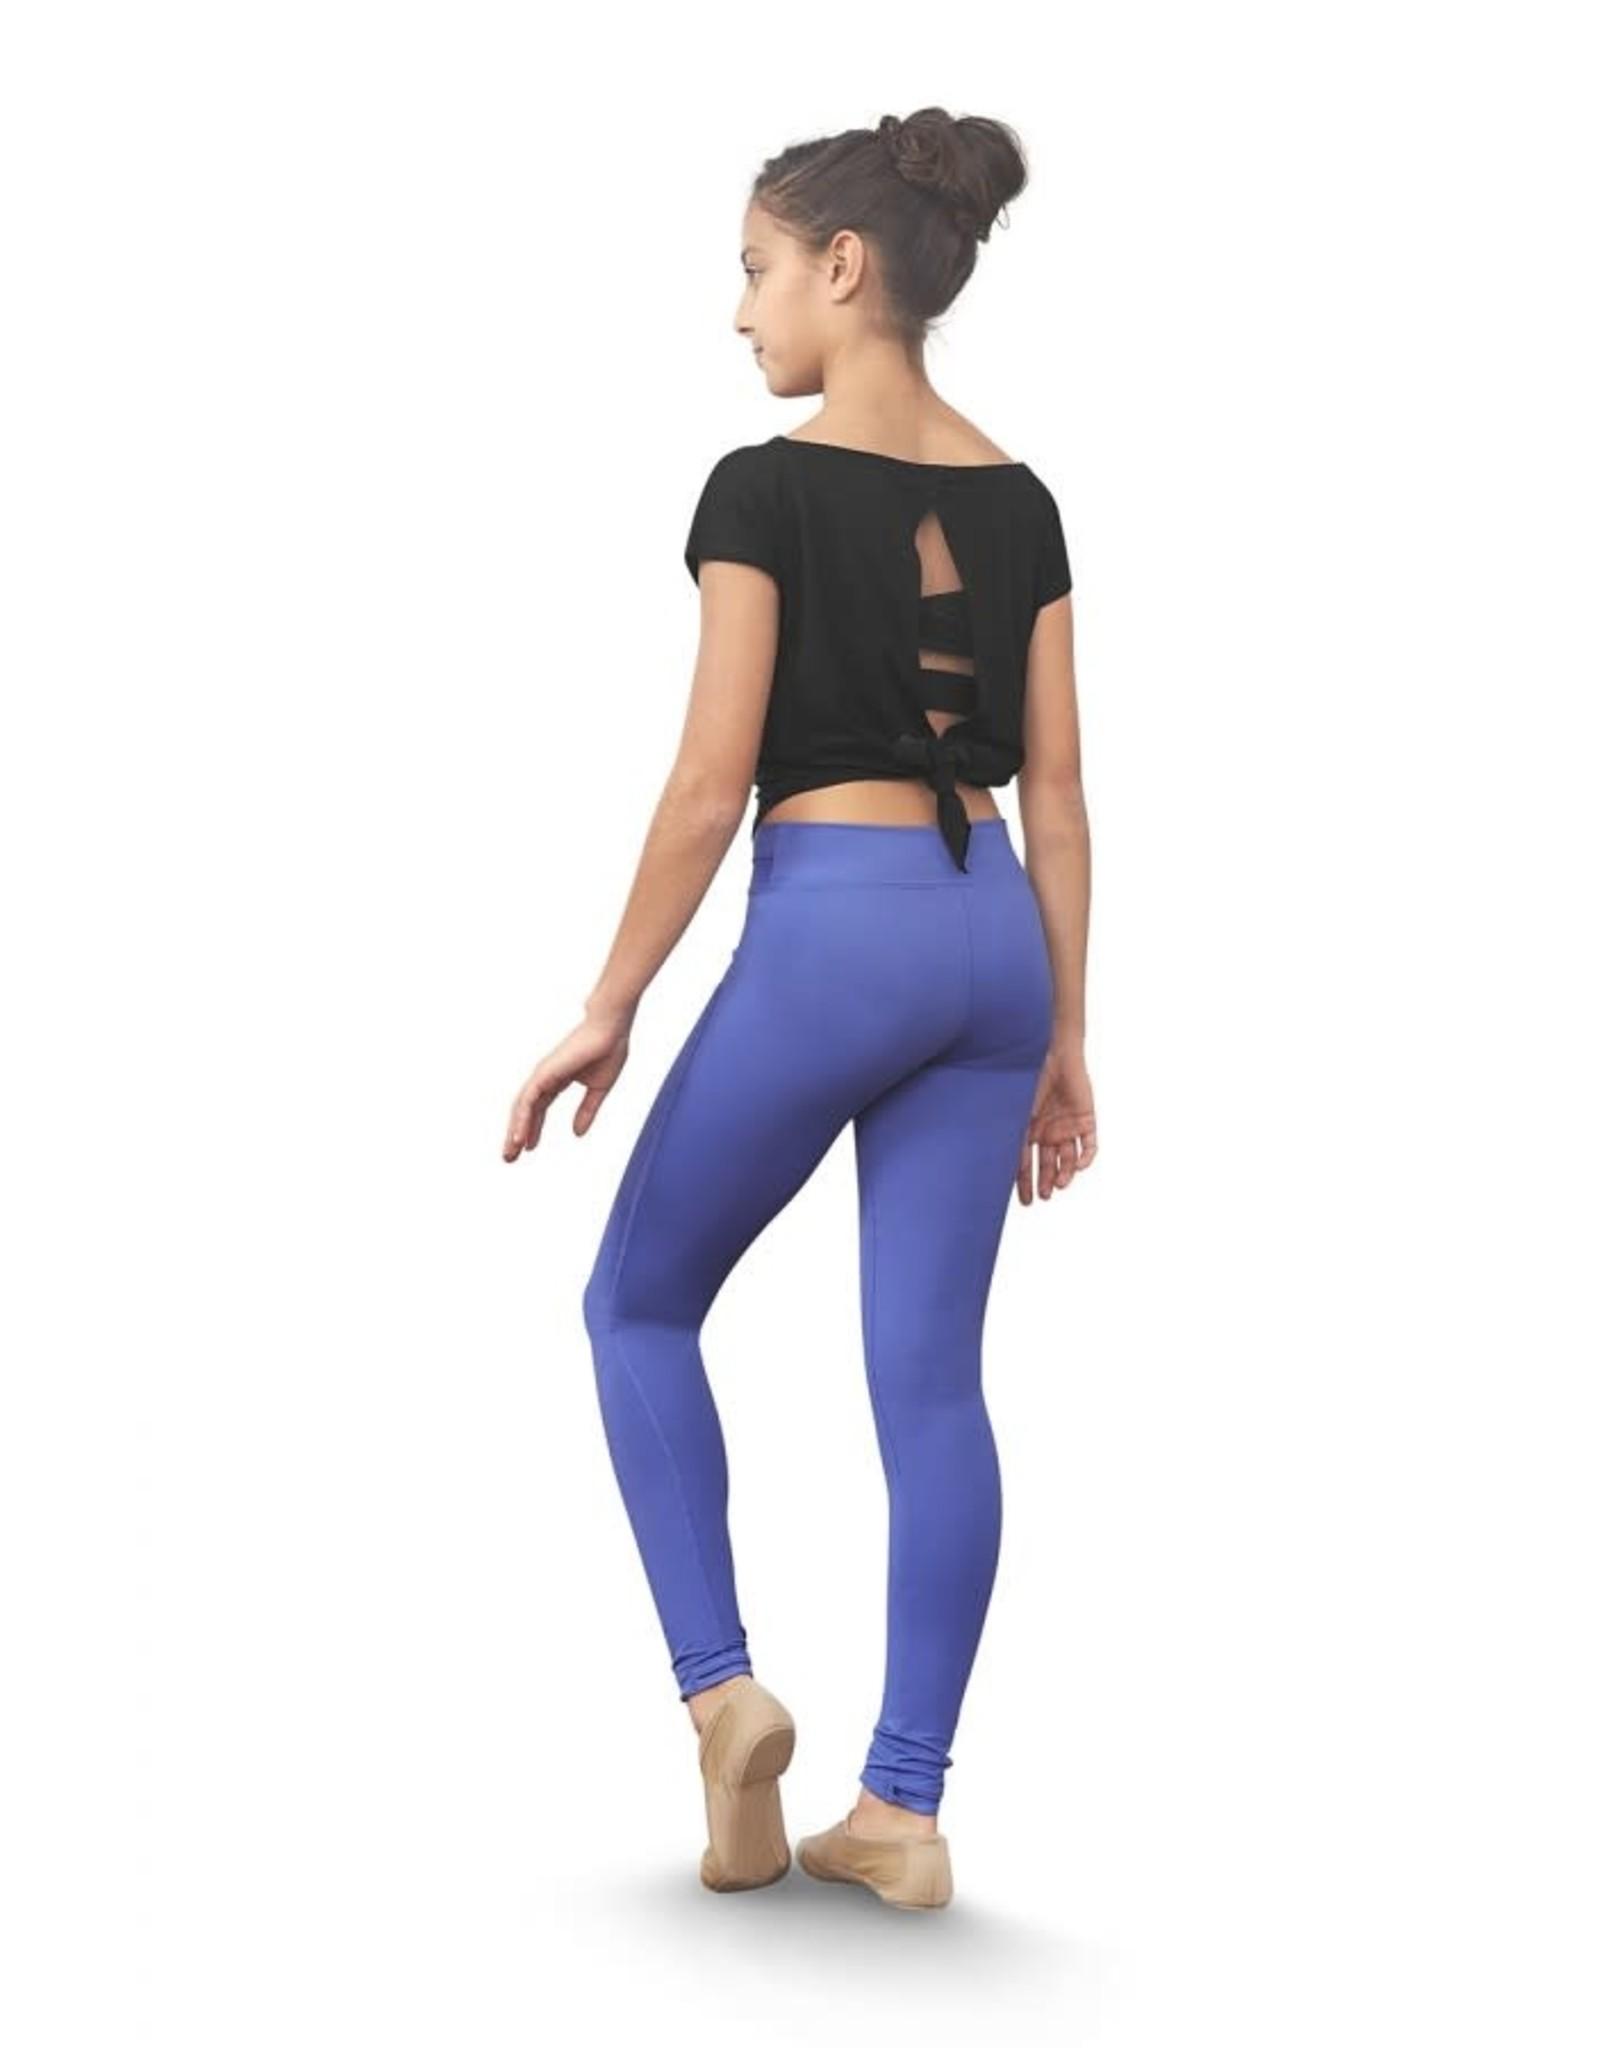 Bloch FP5172C Kaylei stirrup legging